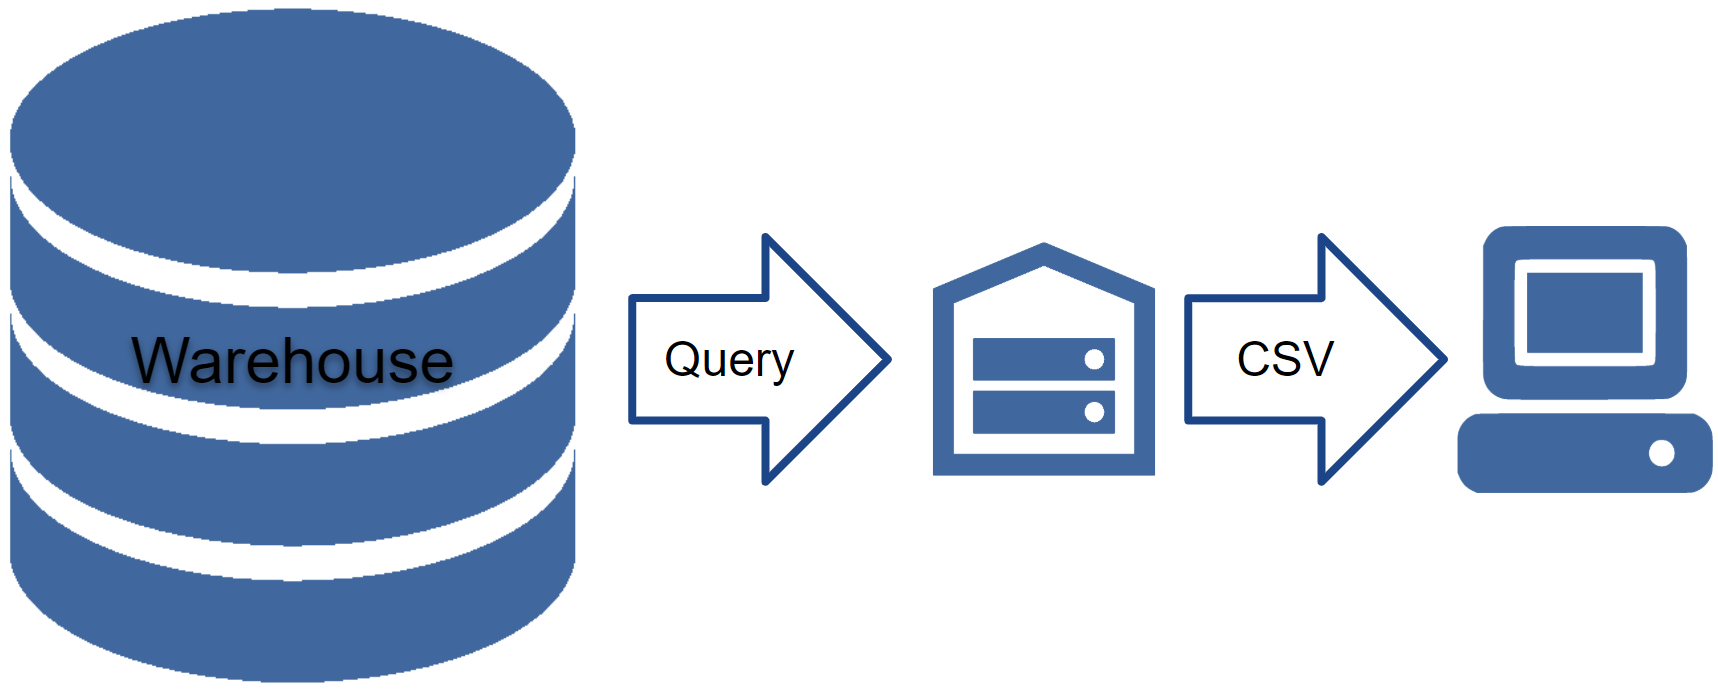 Testing SQL Server code with tSQLt - 6